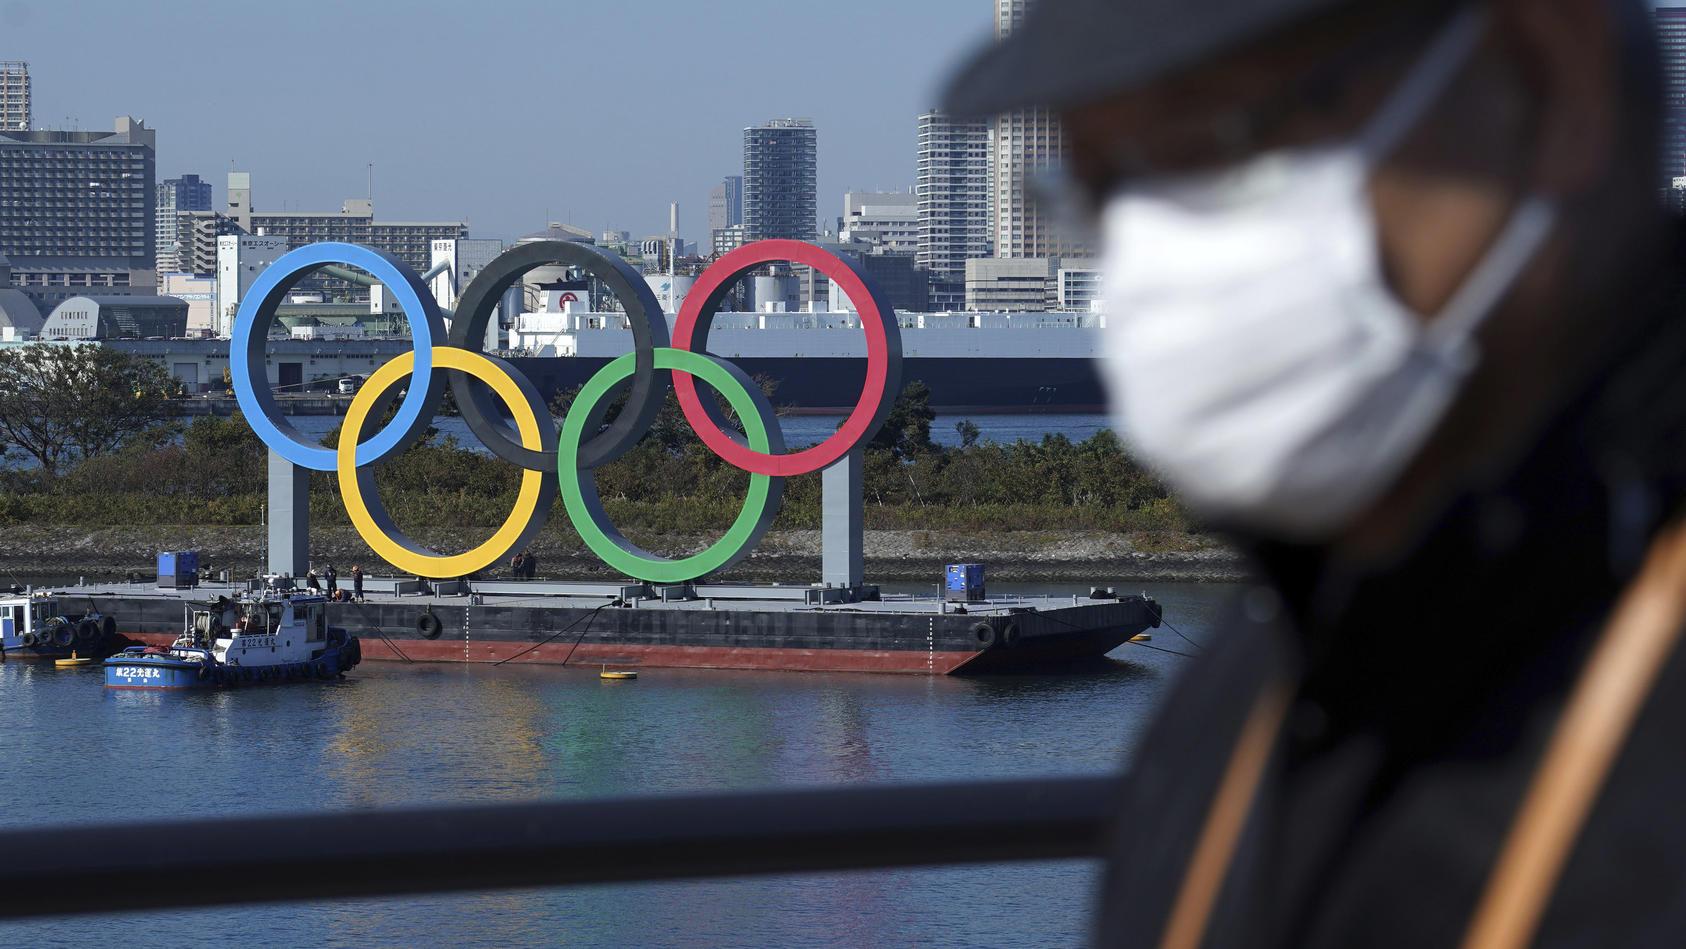 Olympia-Stadt Tokio vor Ausnahmezustand